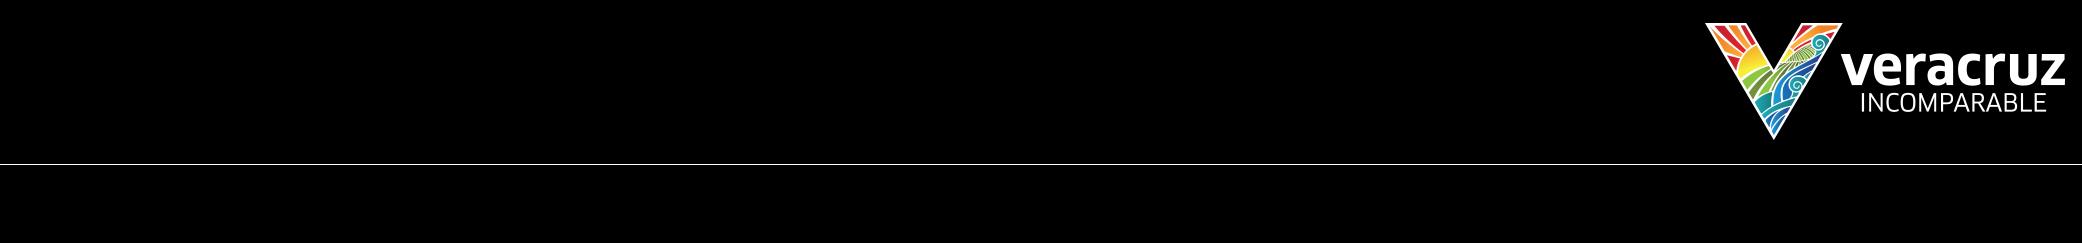 veracruz-logo.png